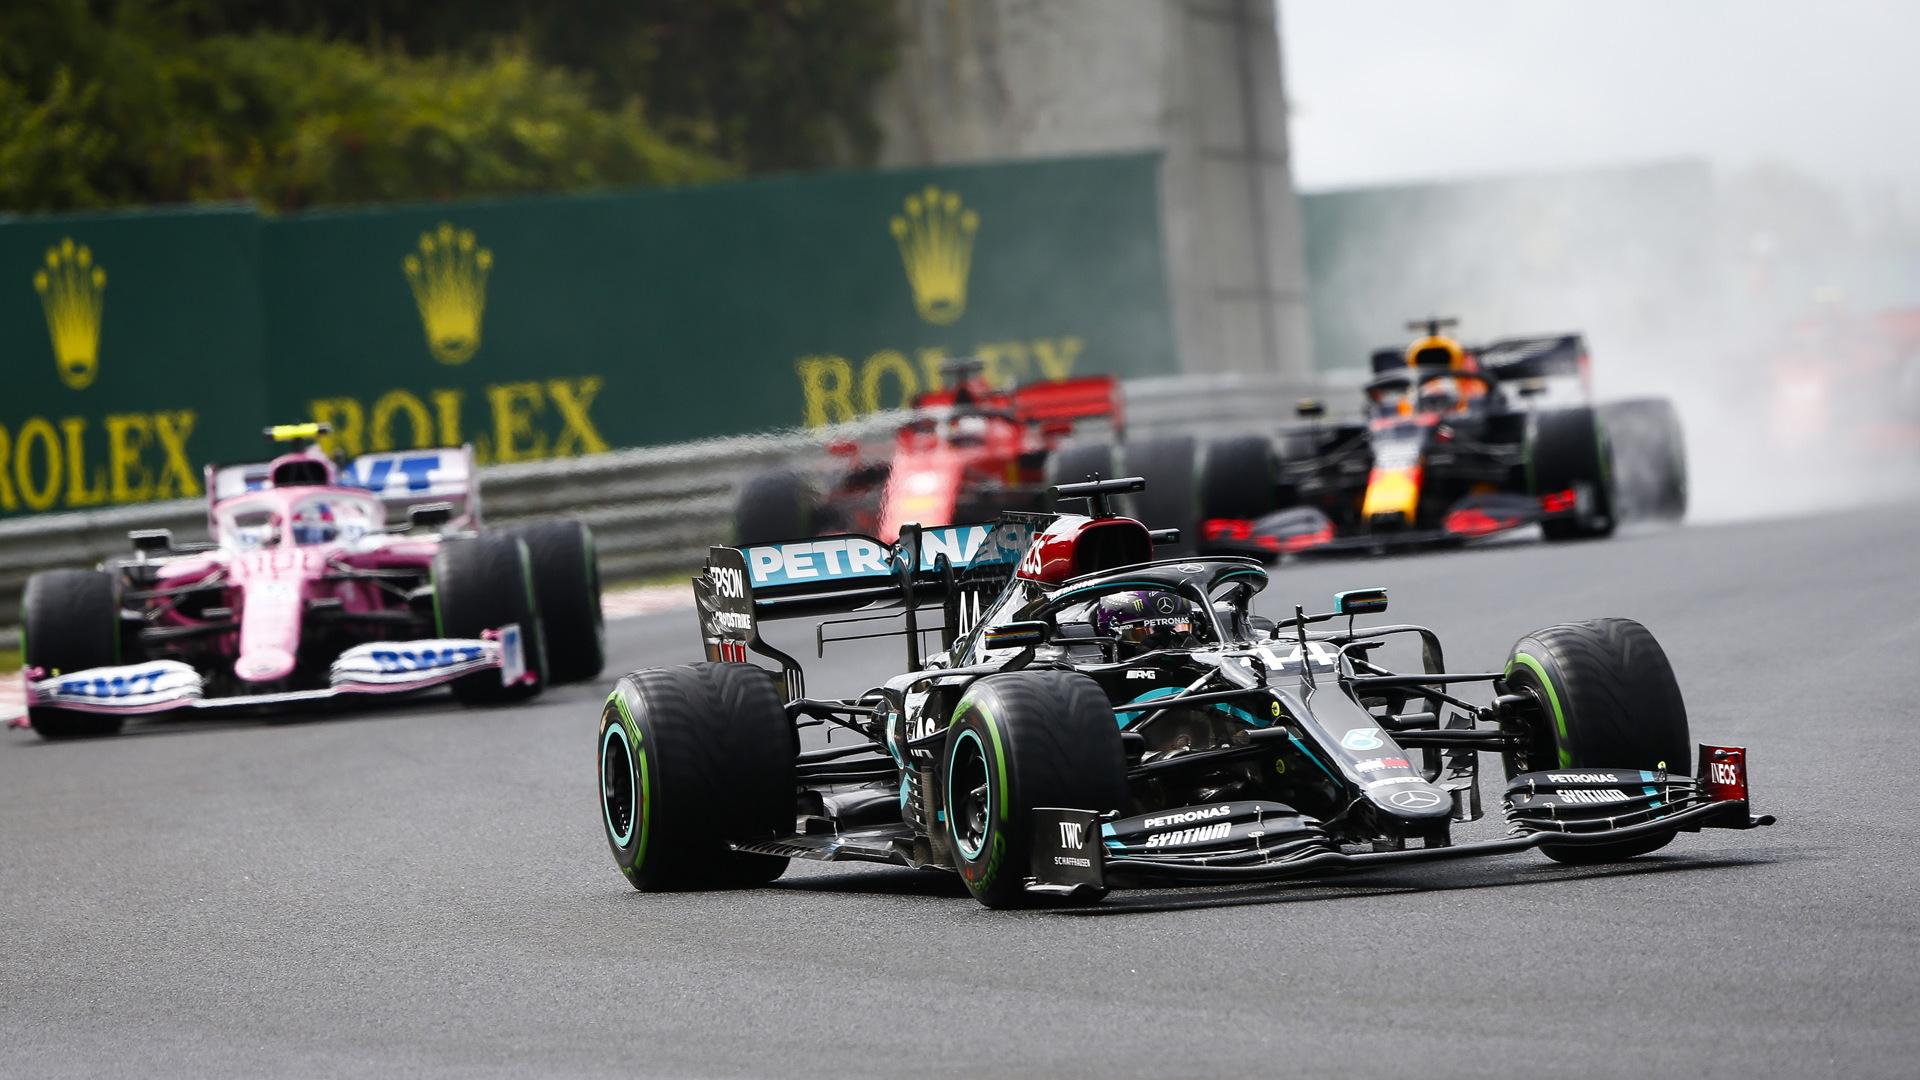 Mercedes-AMG's Lewis Hamilton at the 2020 Formula One Hungarian Grand Prix